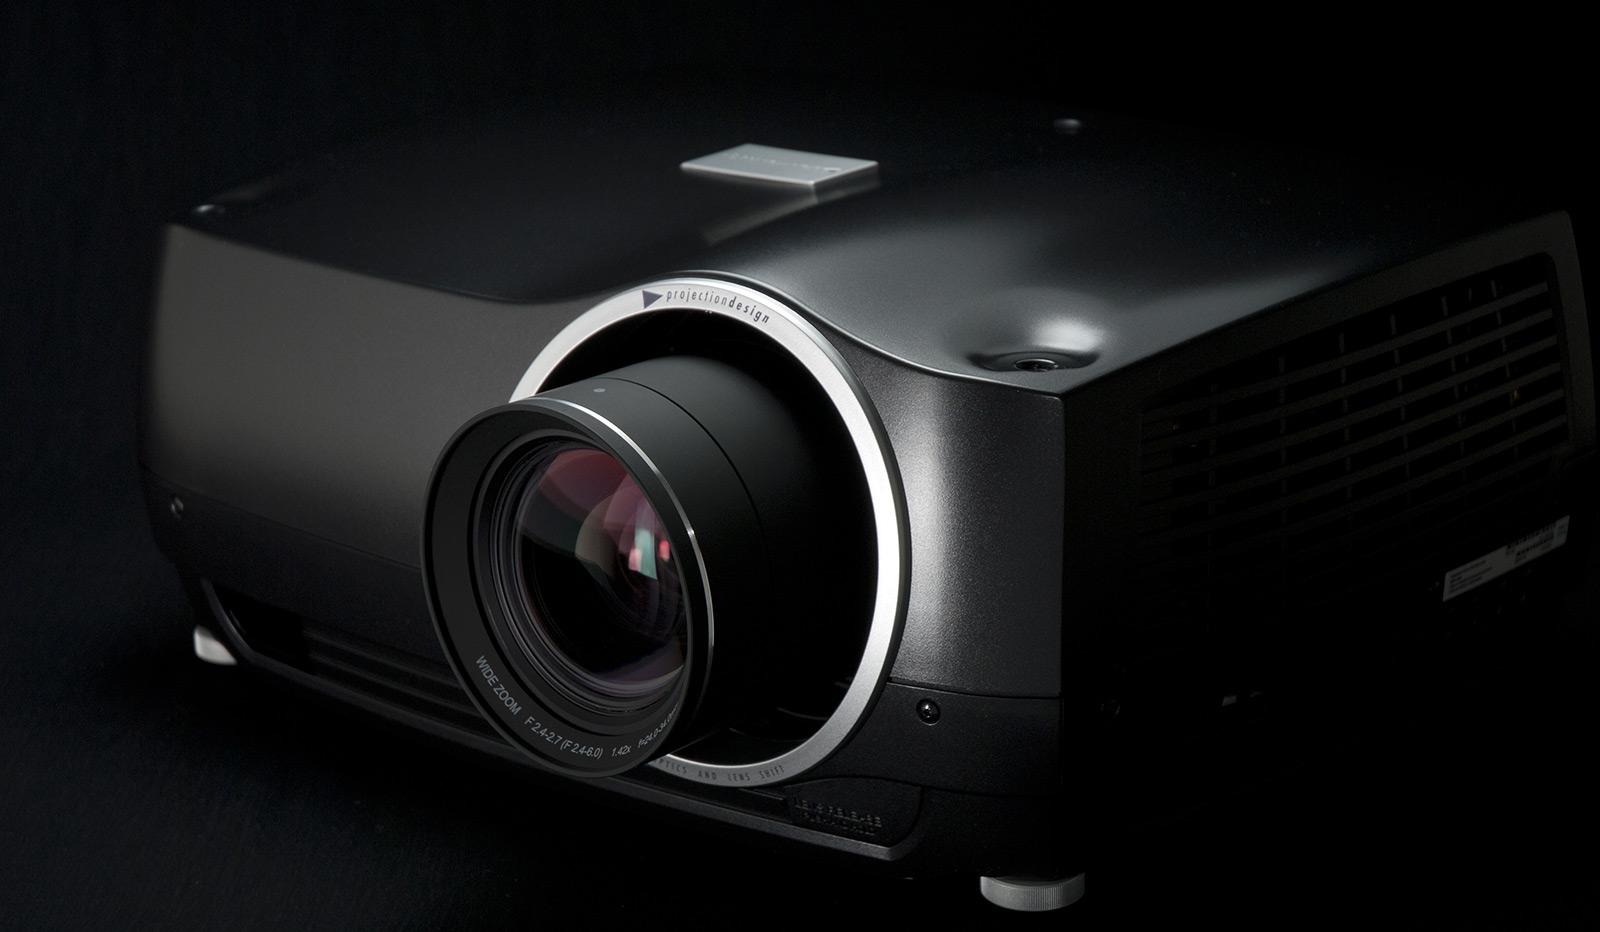 projectordesign-f35-as3d-projector